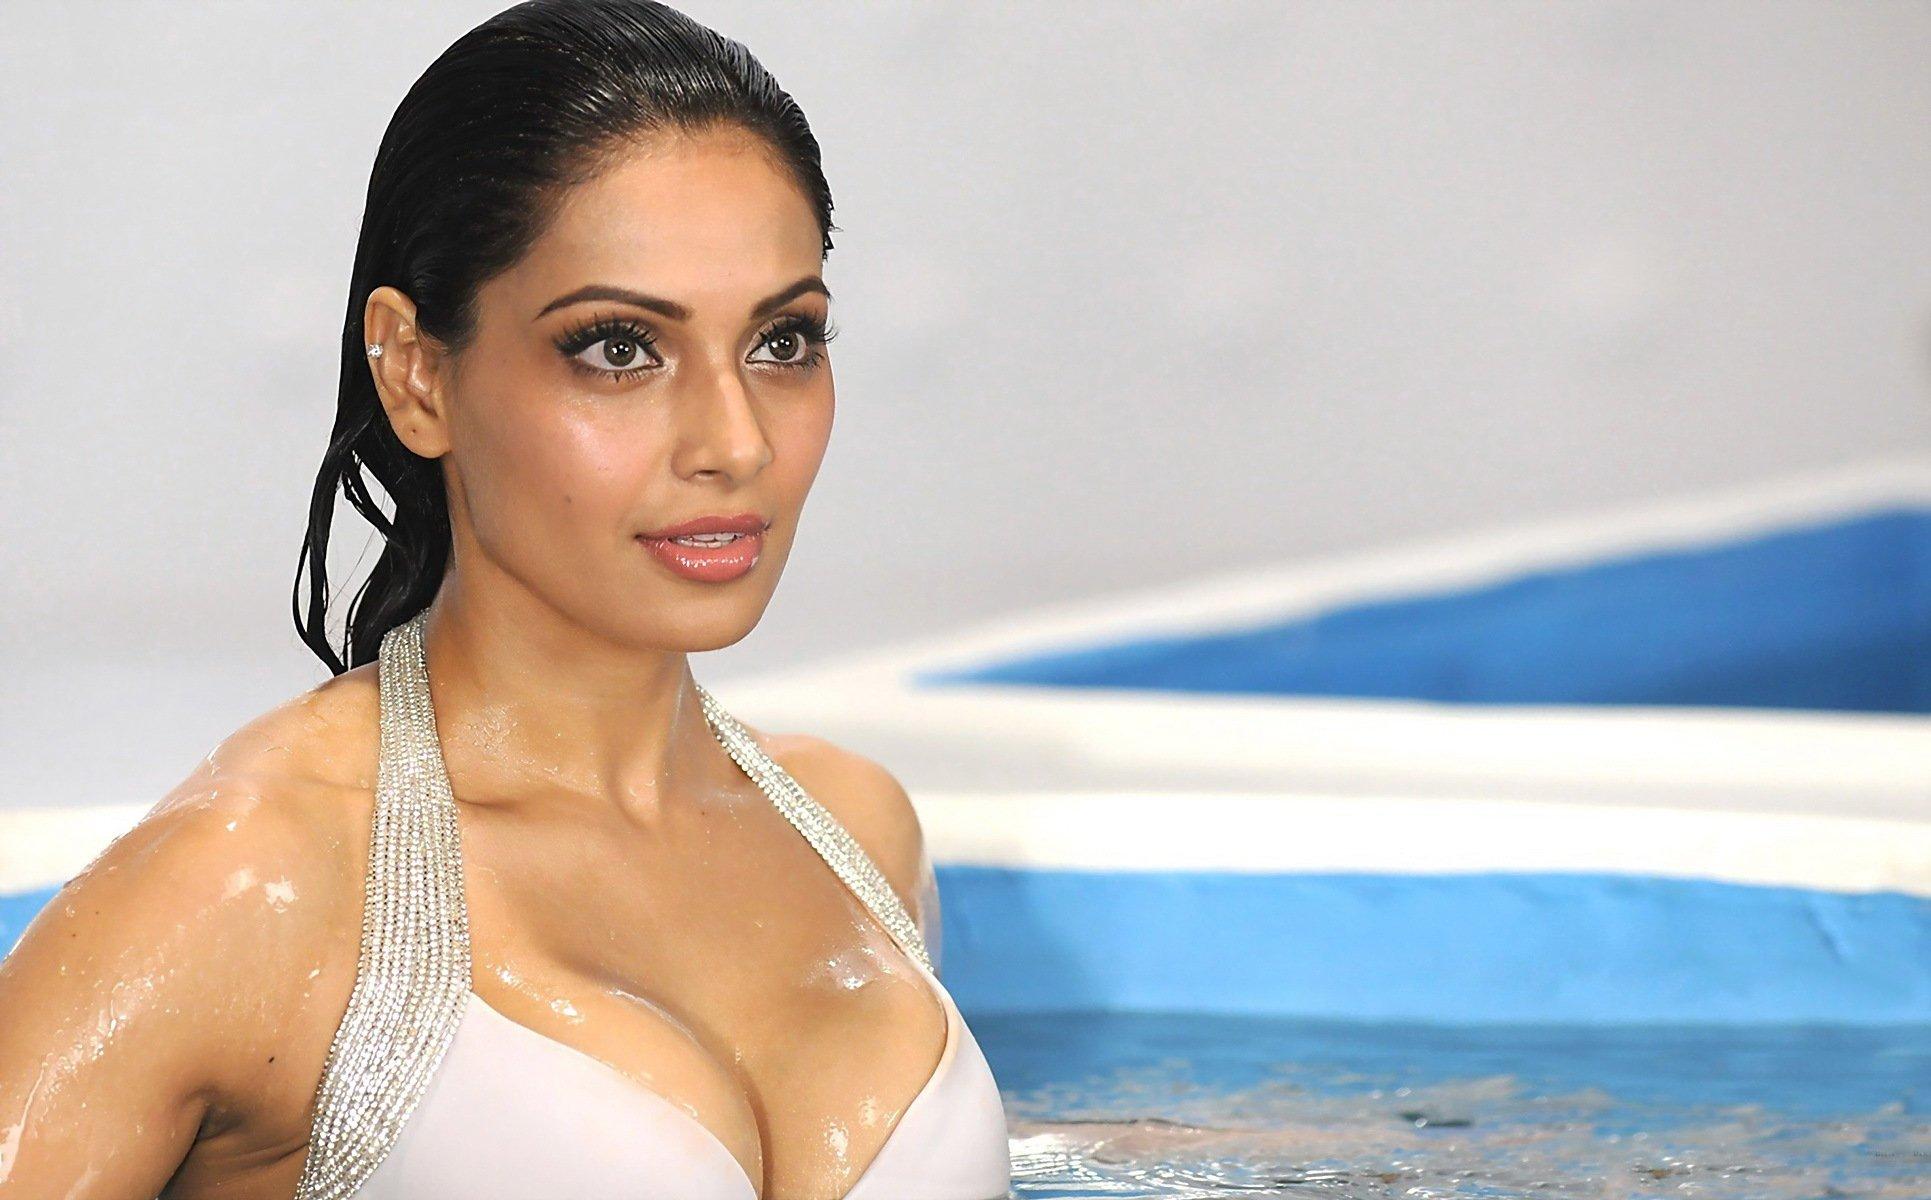 Bipasha basu most sexiest bikini photos